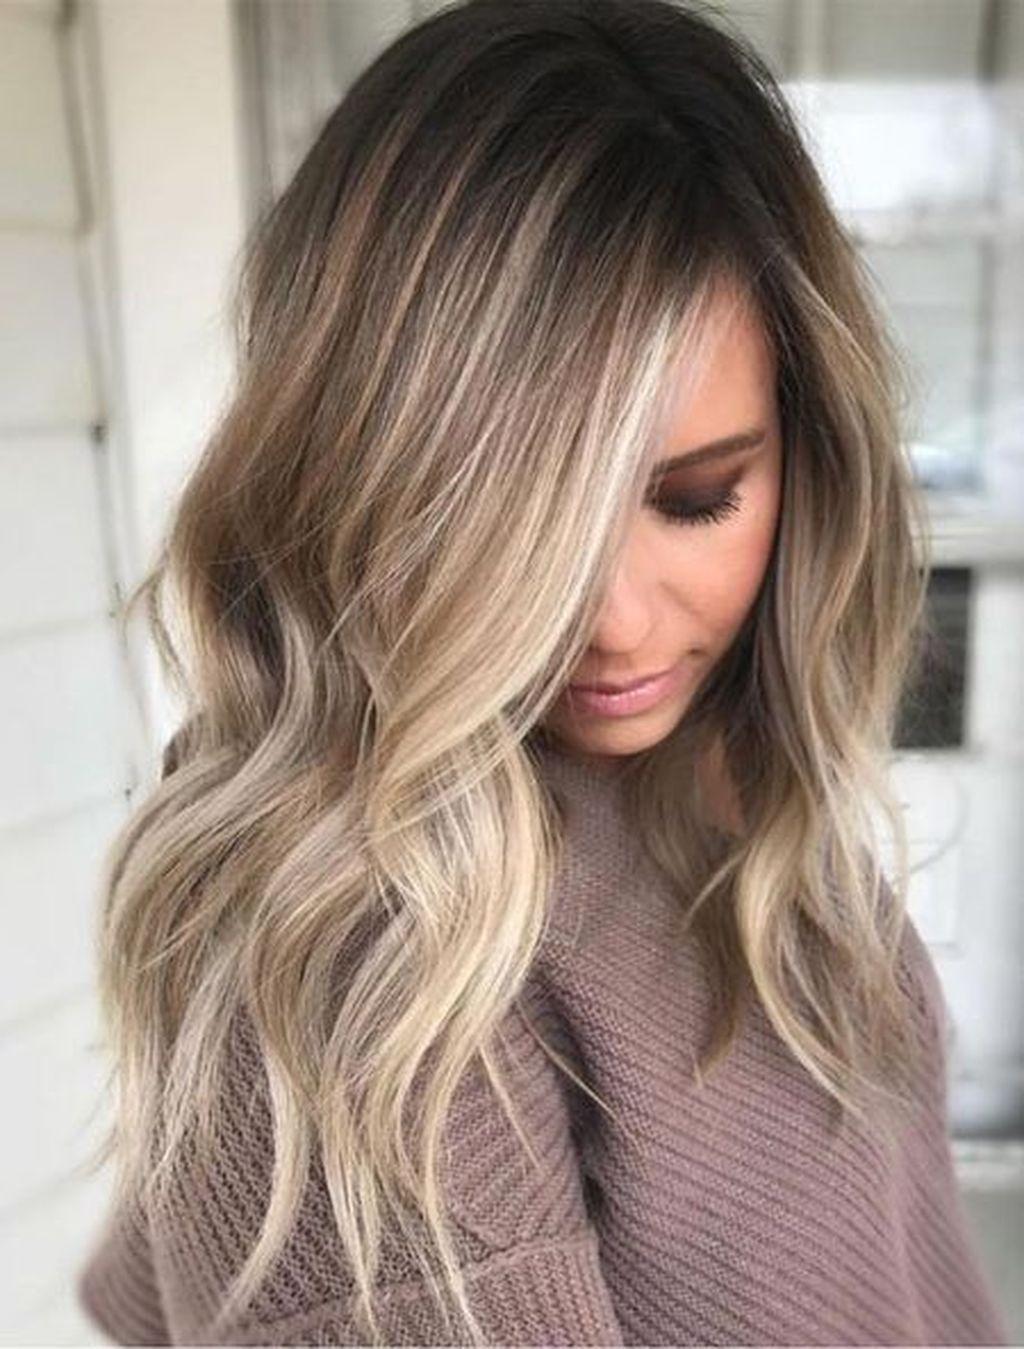 inspiring long hair style